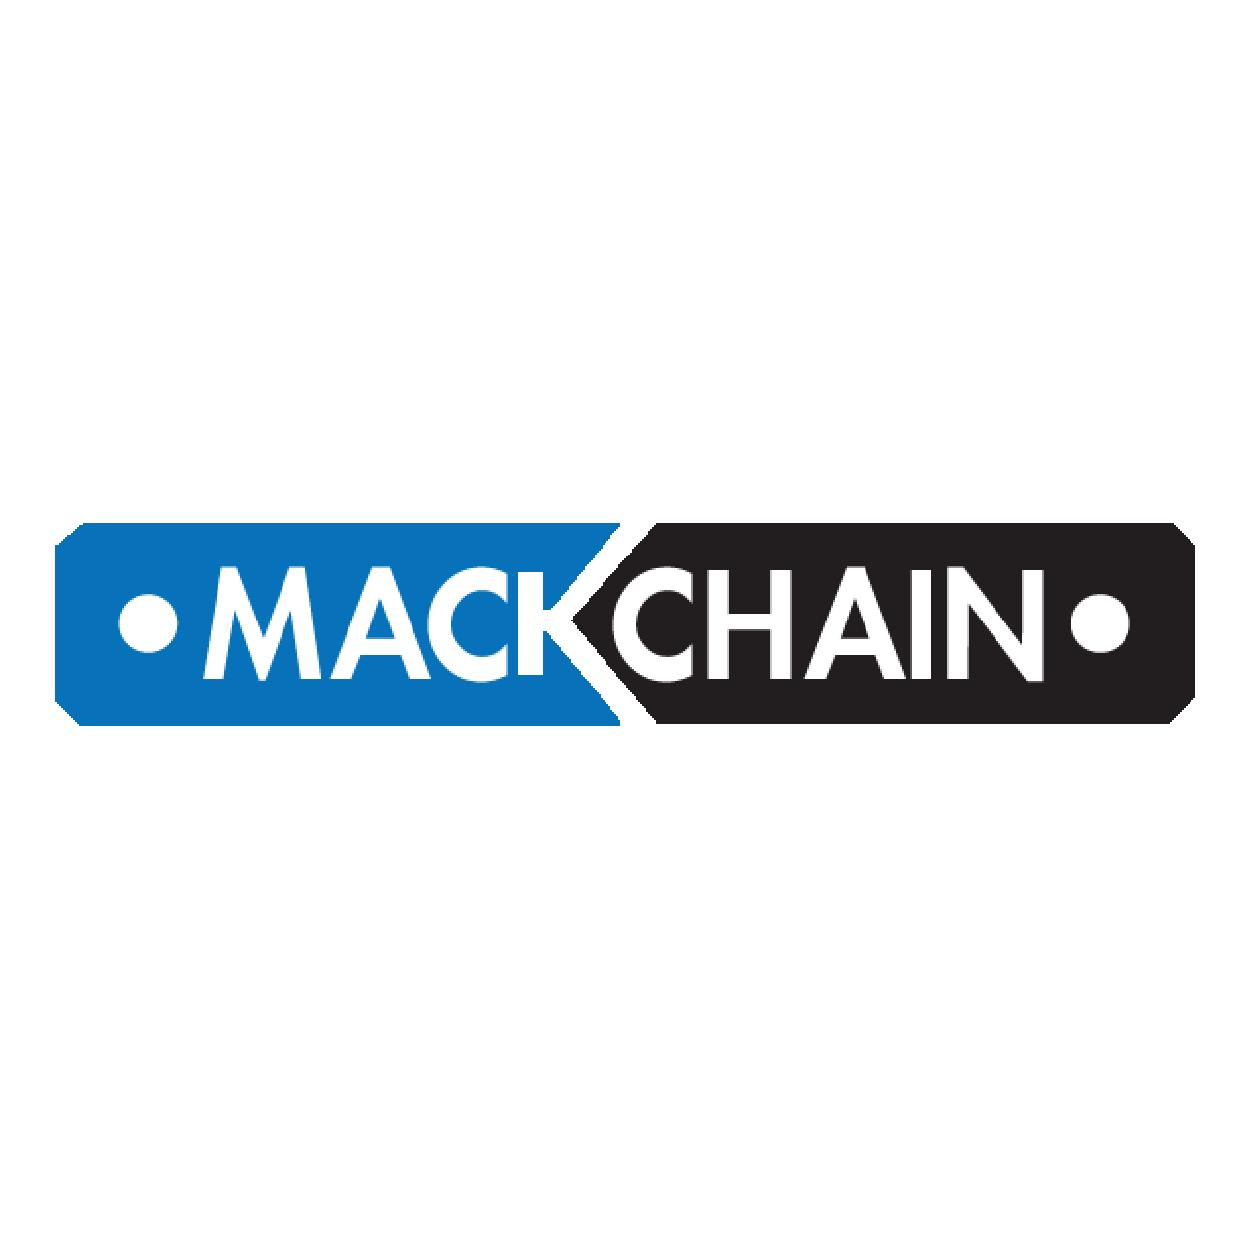 MACKCHAIN 300px-01